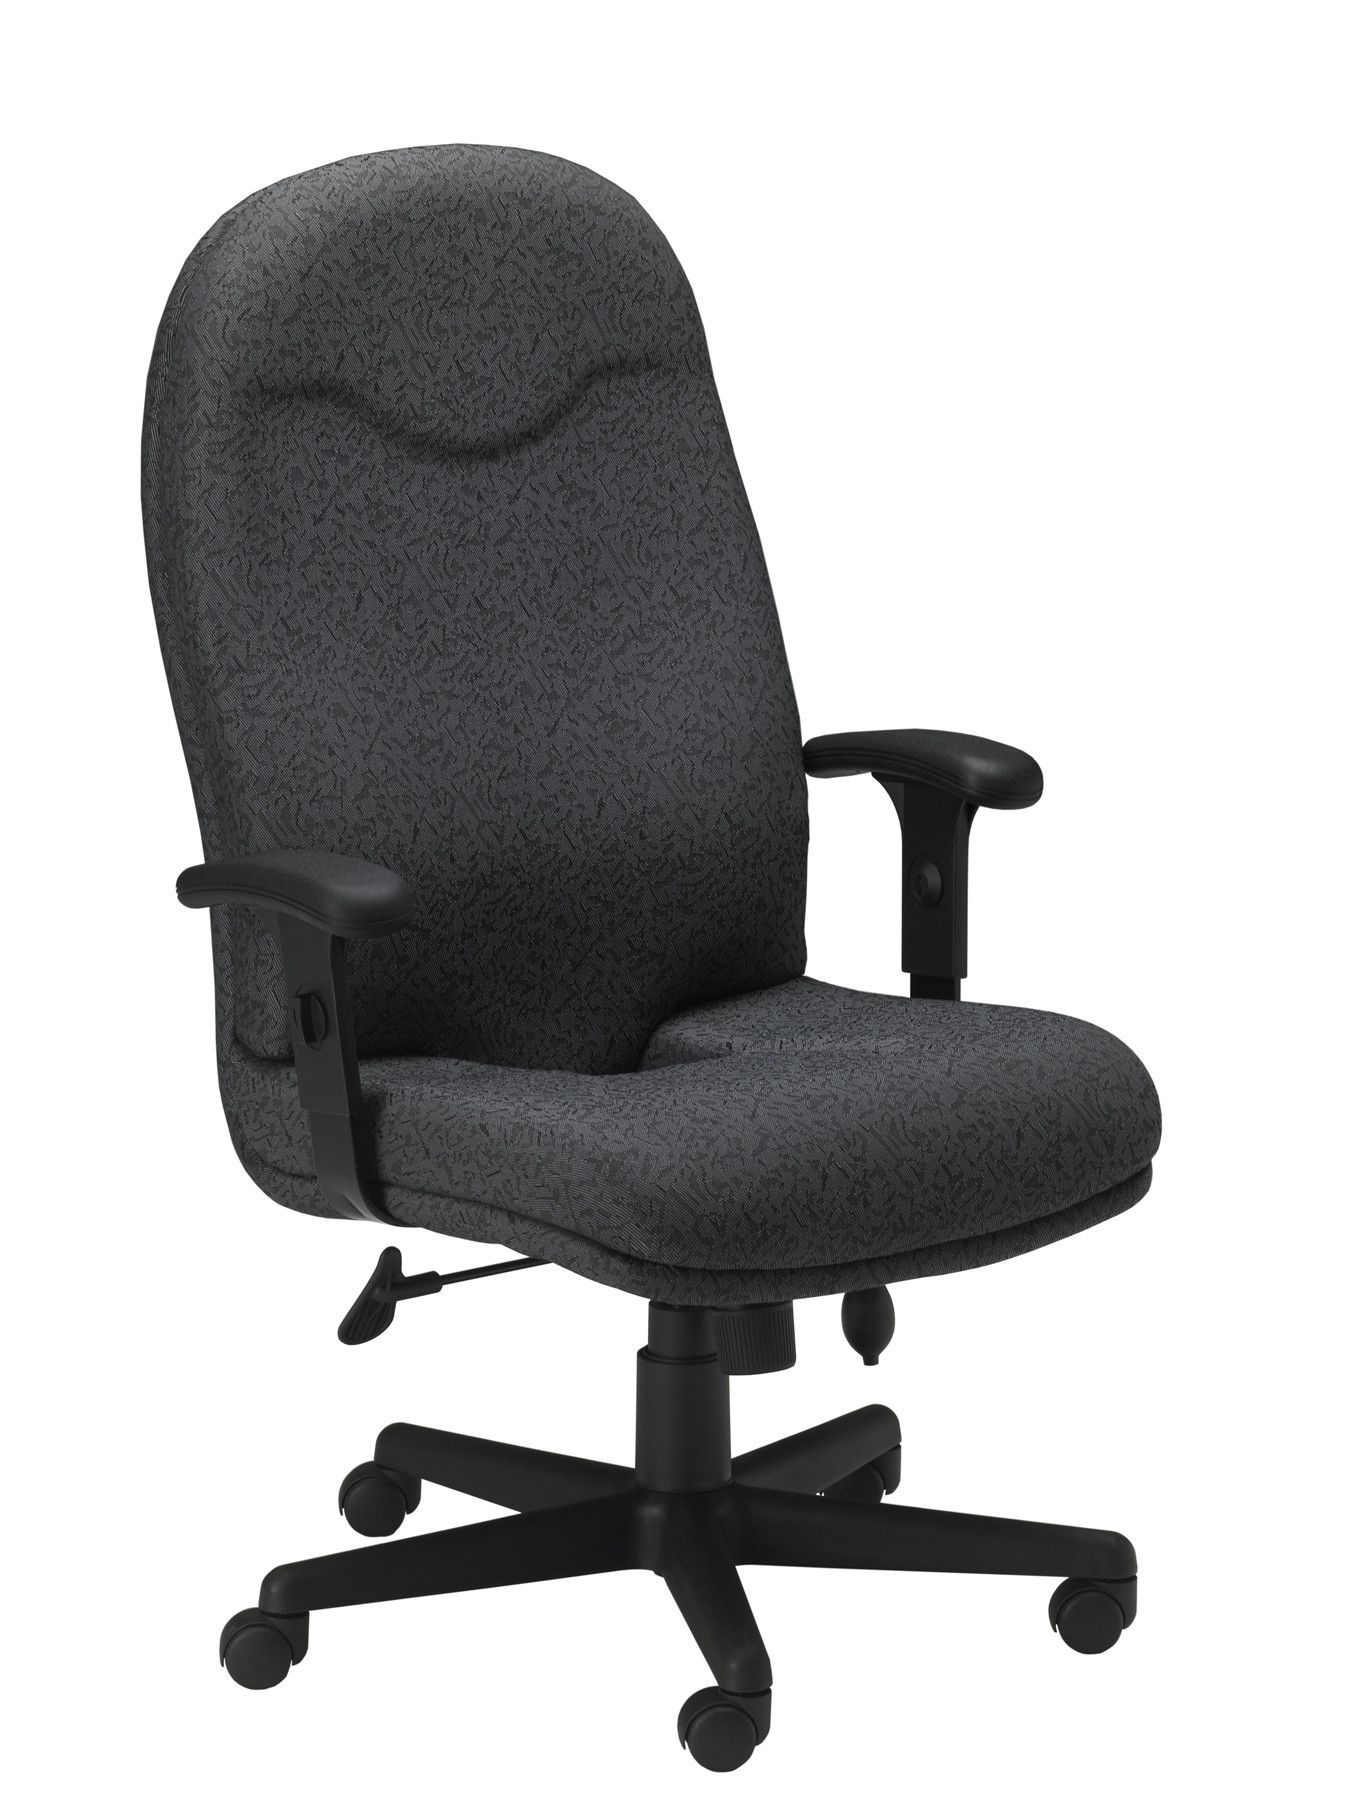 High Back Executive Chair High Back Chairs Office Chair Chair